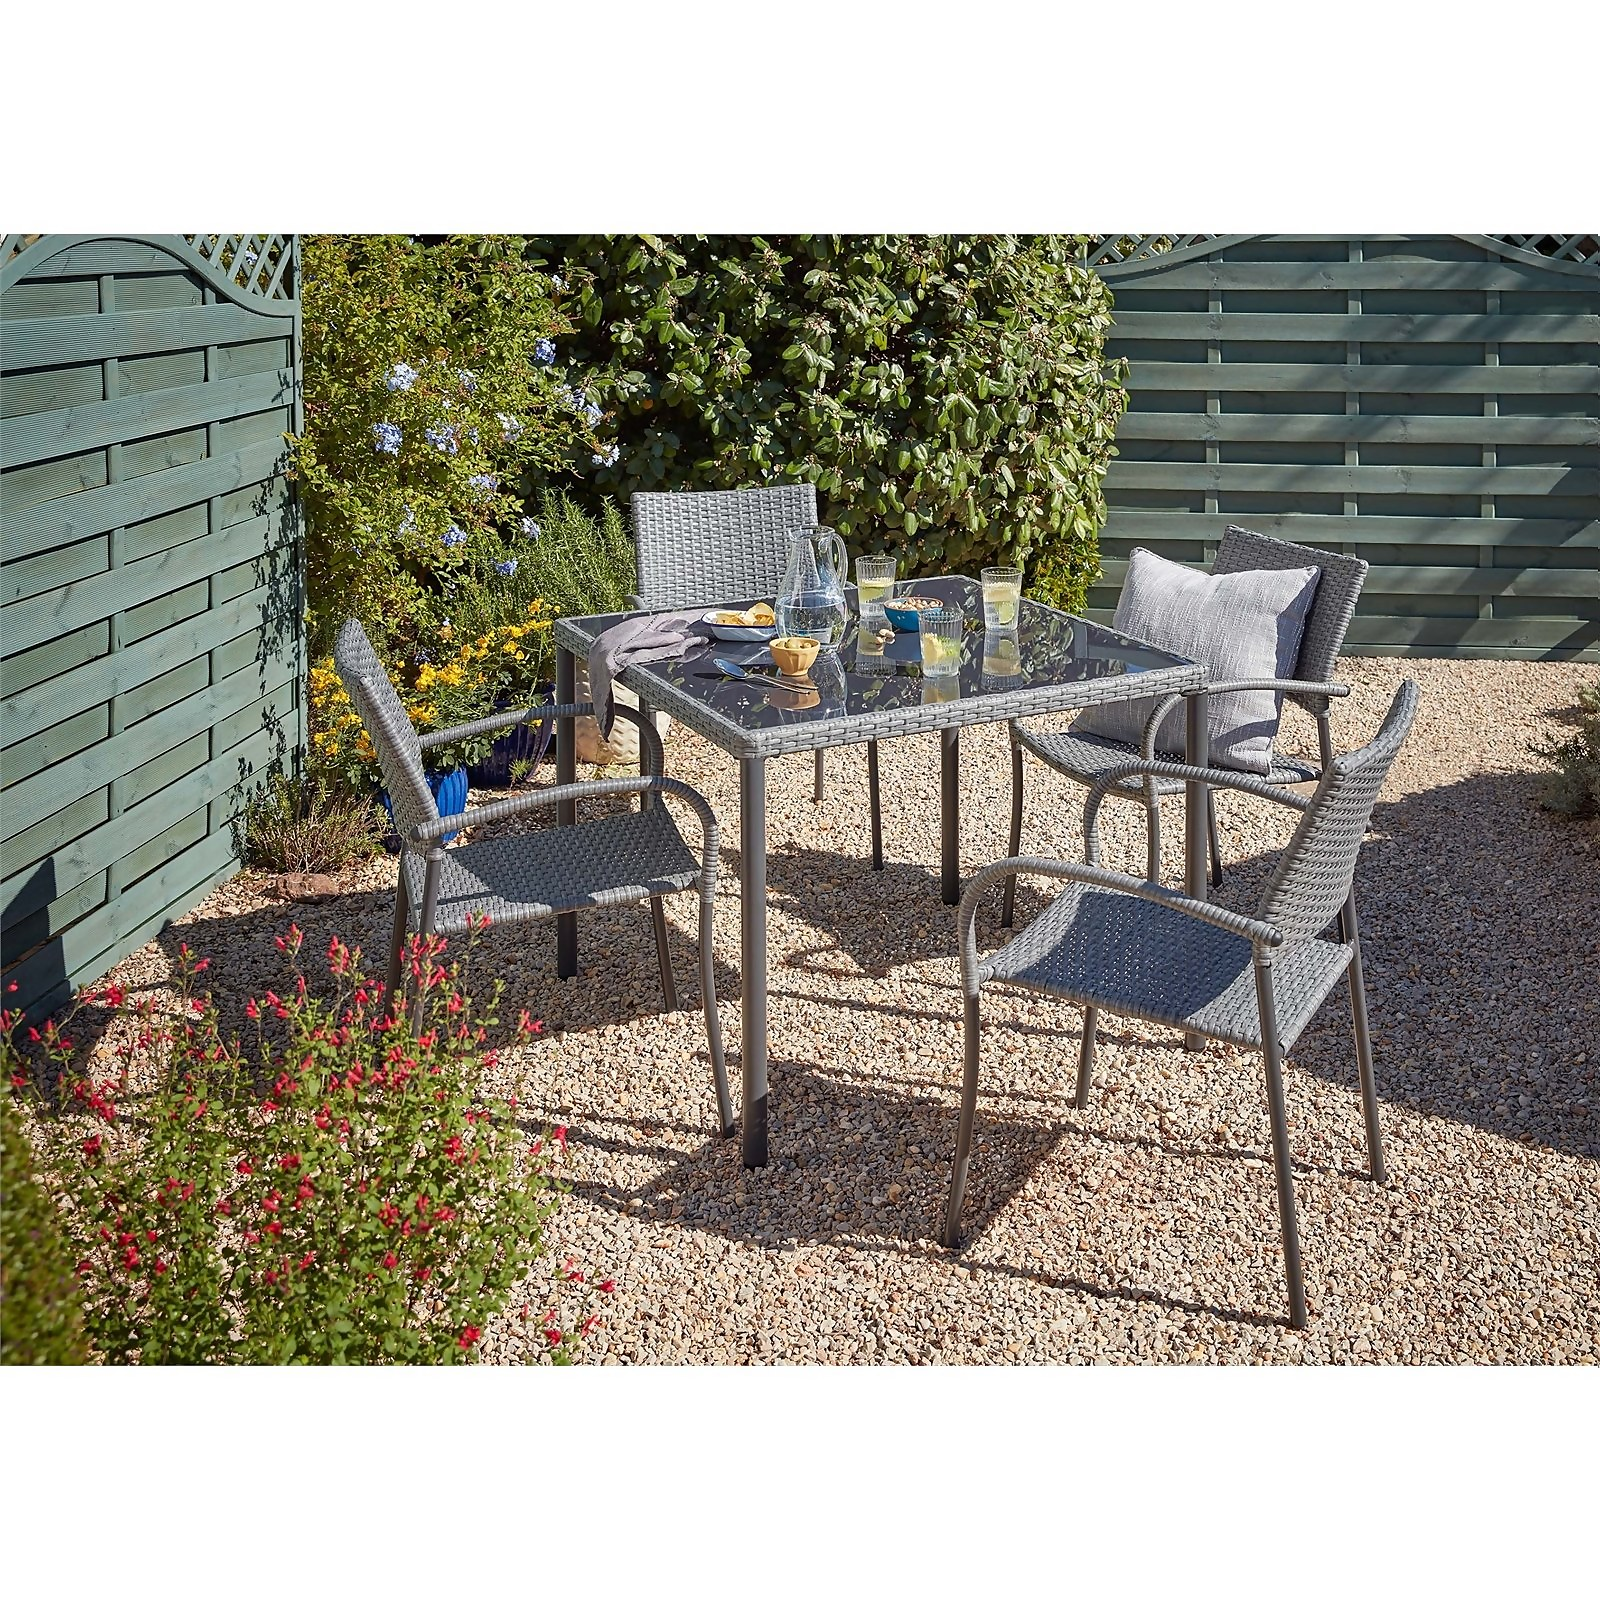 Bambrick 4 Seater Garden Dining Set